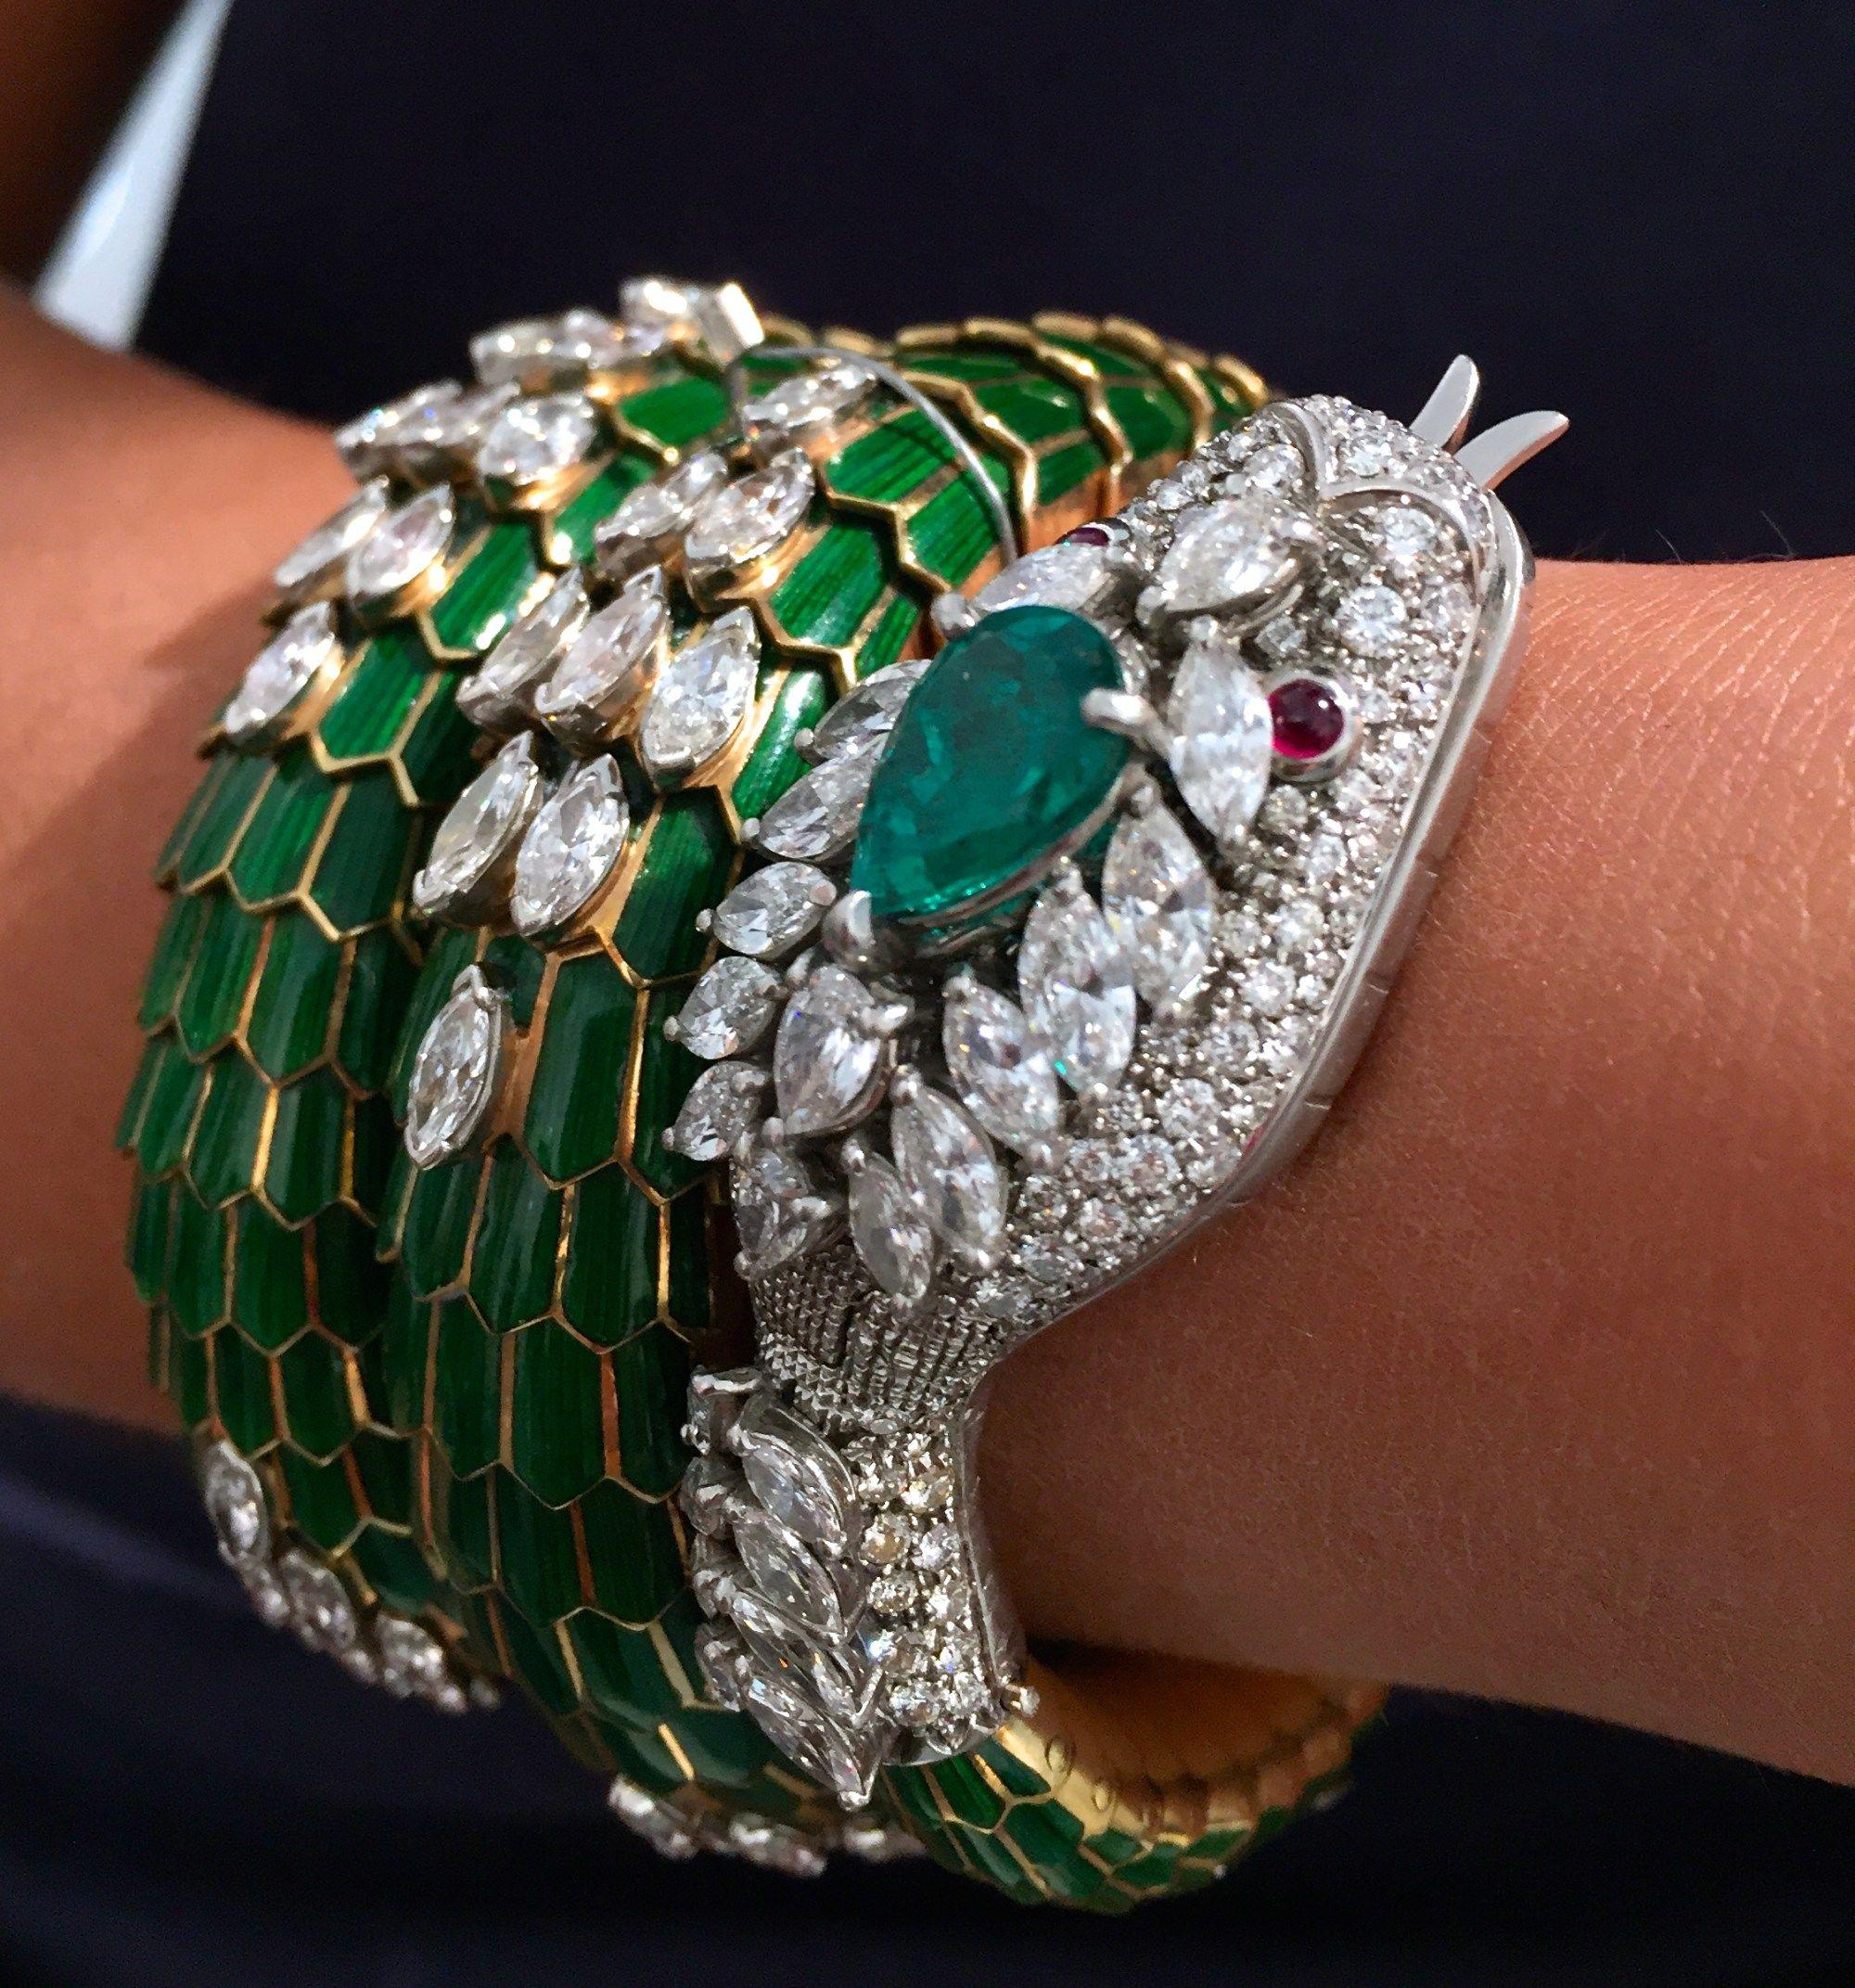 Sothebyus dubai bulgari esprit joaillerie bracelets and bangles